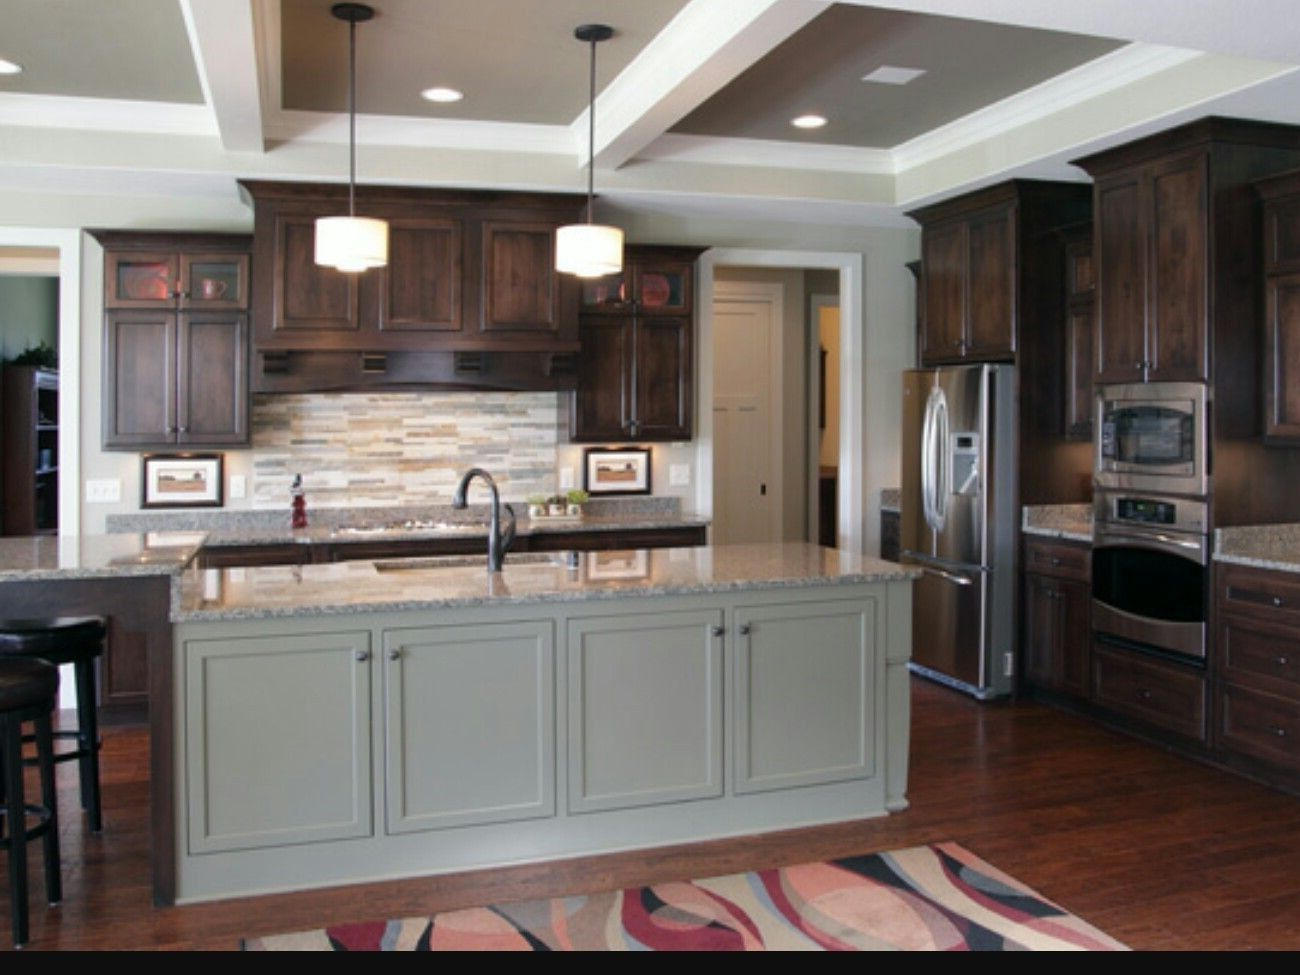 Is honey oak coming back? Can you paint oak kitchen cabinets. #honeyoakcabinets